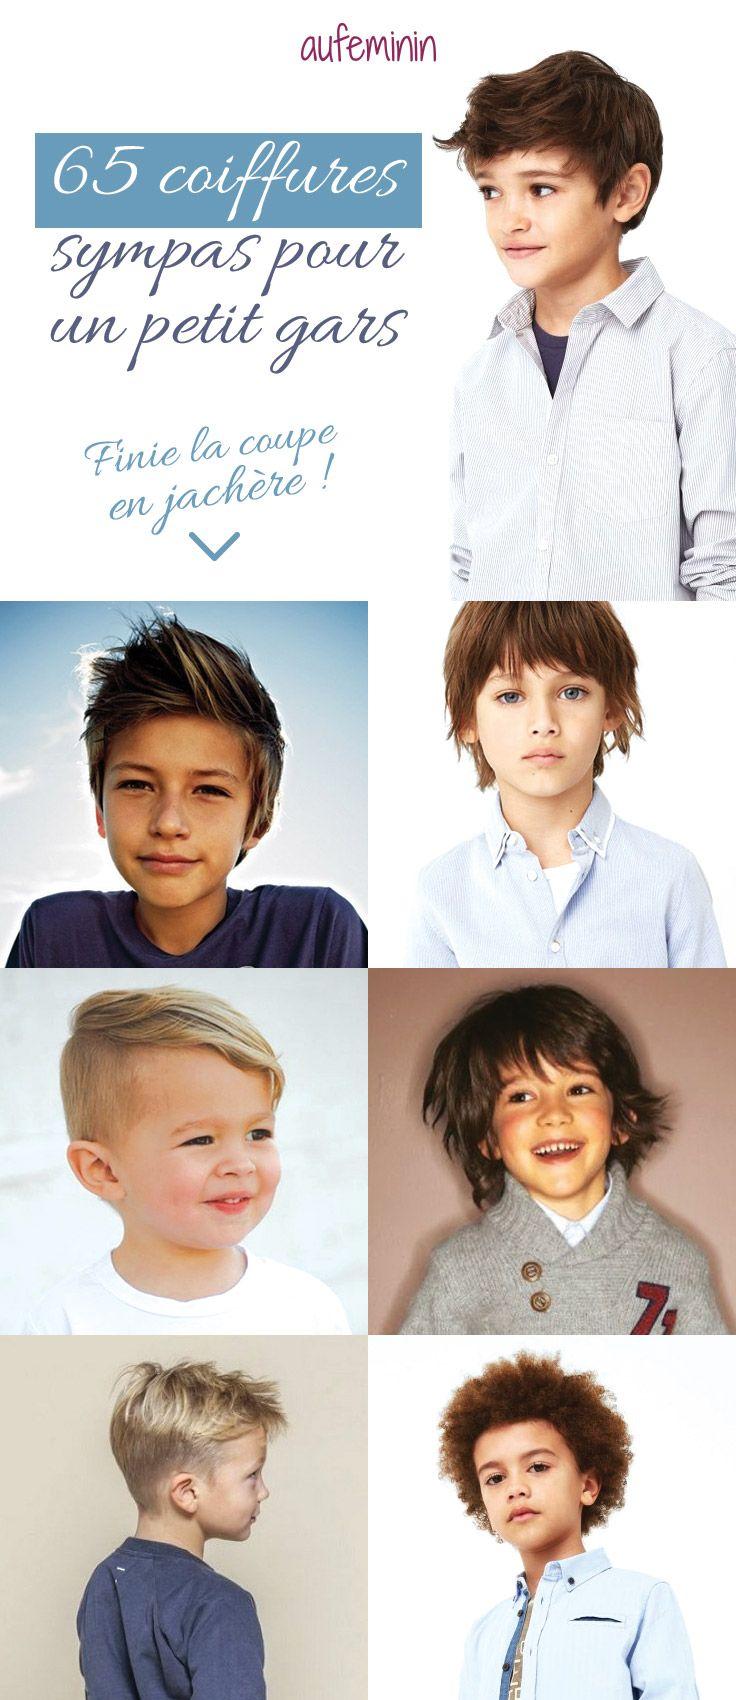 25 best ideas about coiffures courtes on pinterest revlon professional short cuts and long - Coiffure petit garcon ...